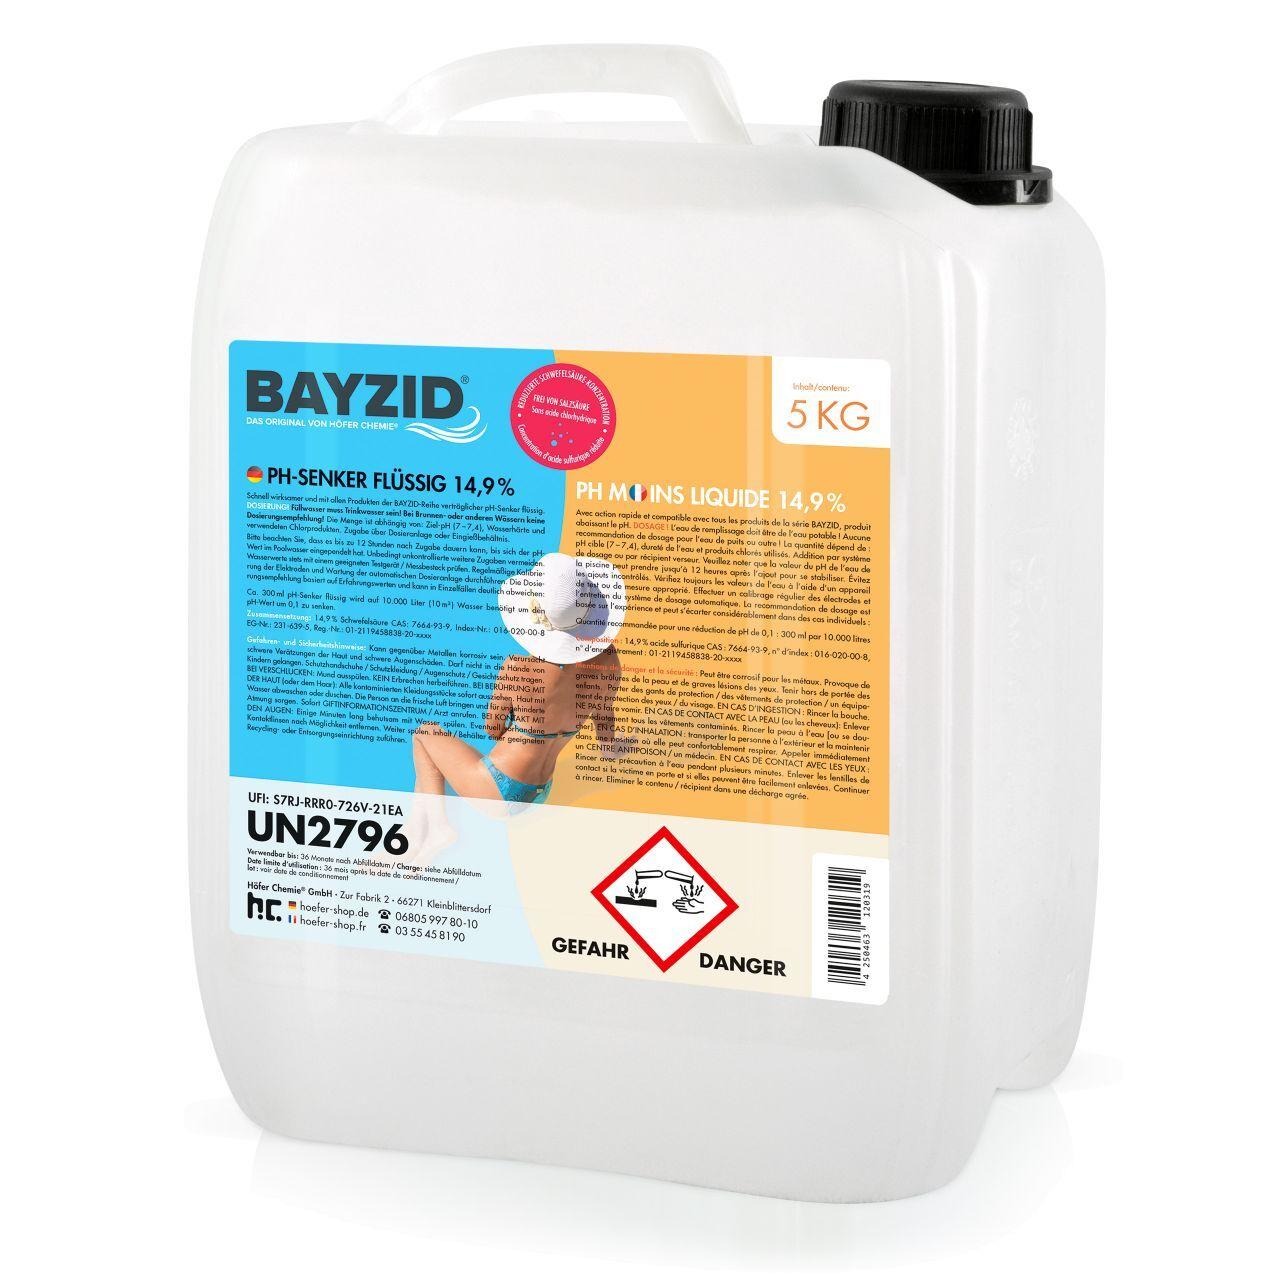 BAYZID 10 kg pH moins liquide (2 x 5 kg)